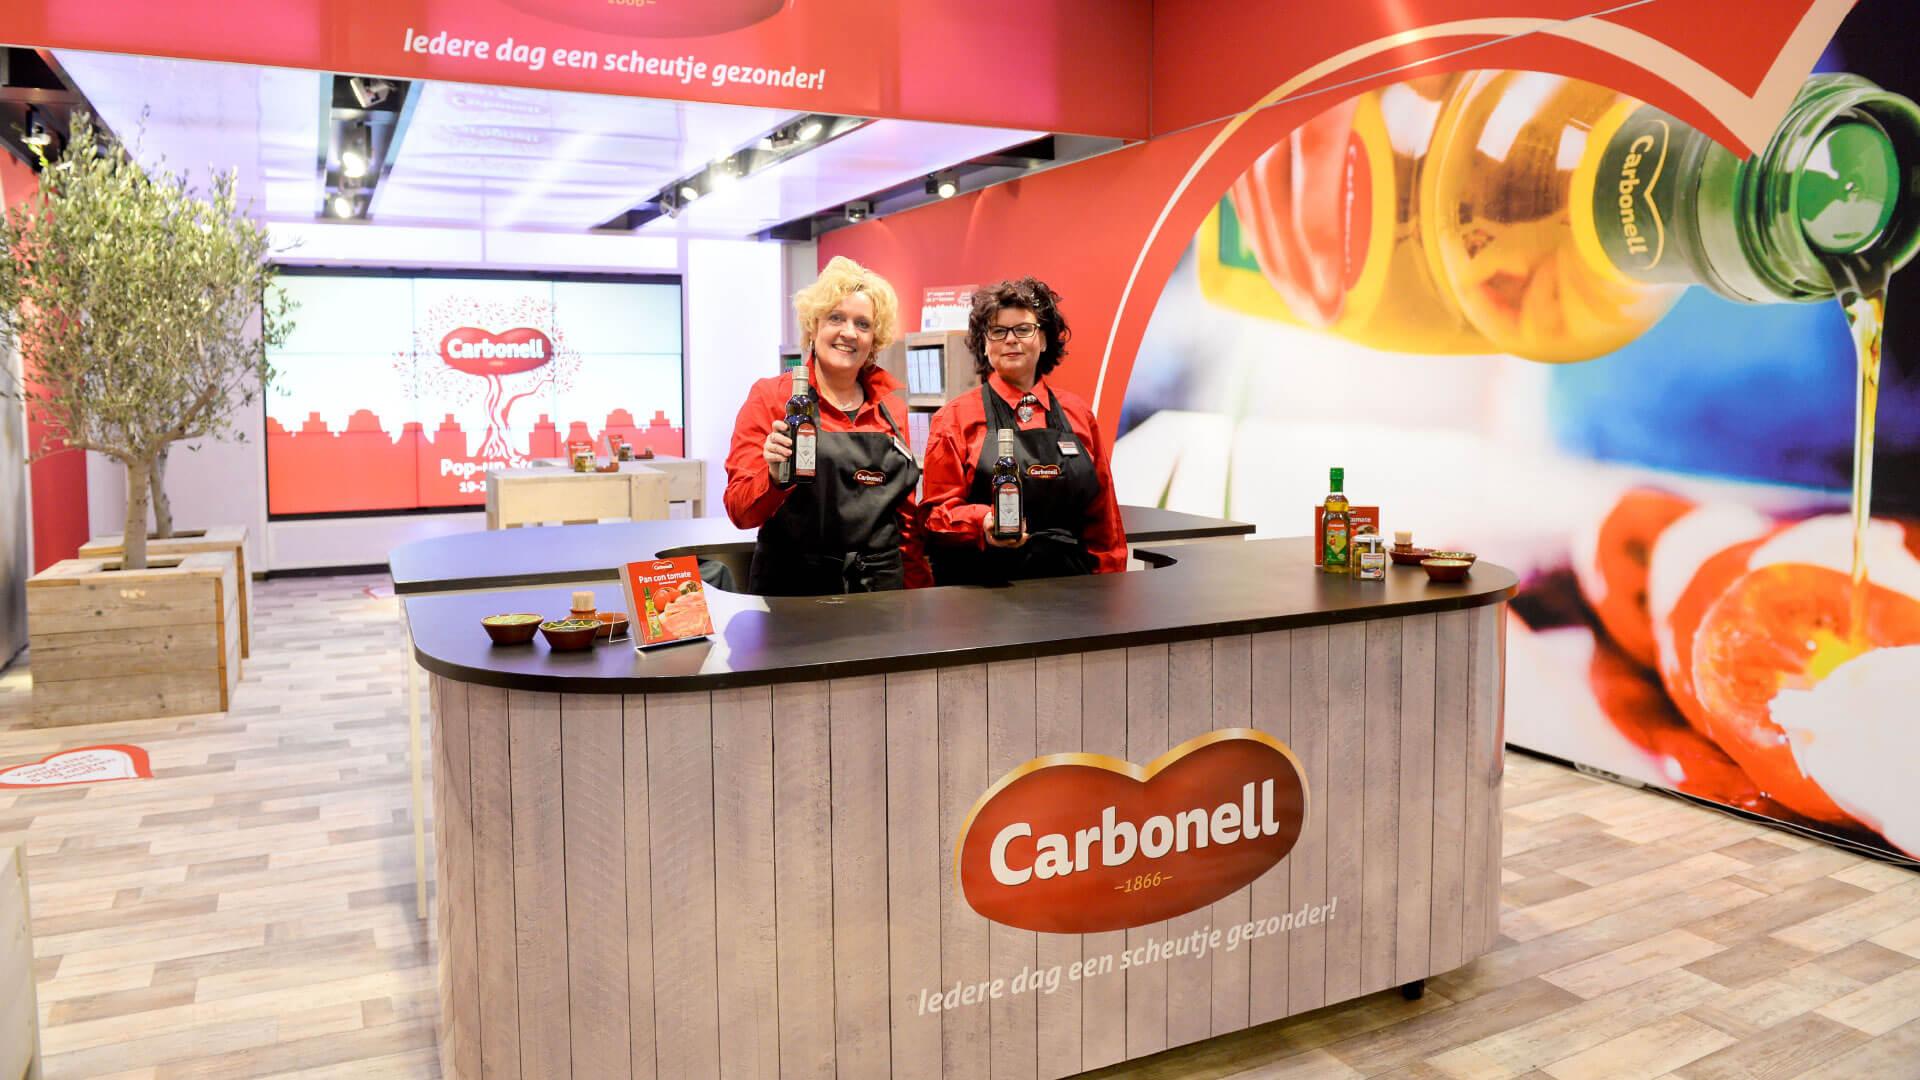 Carbonell Olys Pop-up Store Kalverstraat